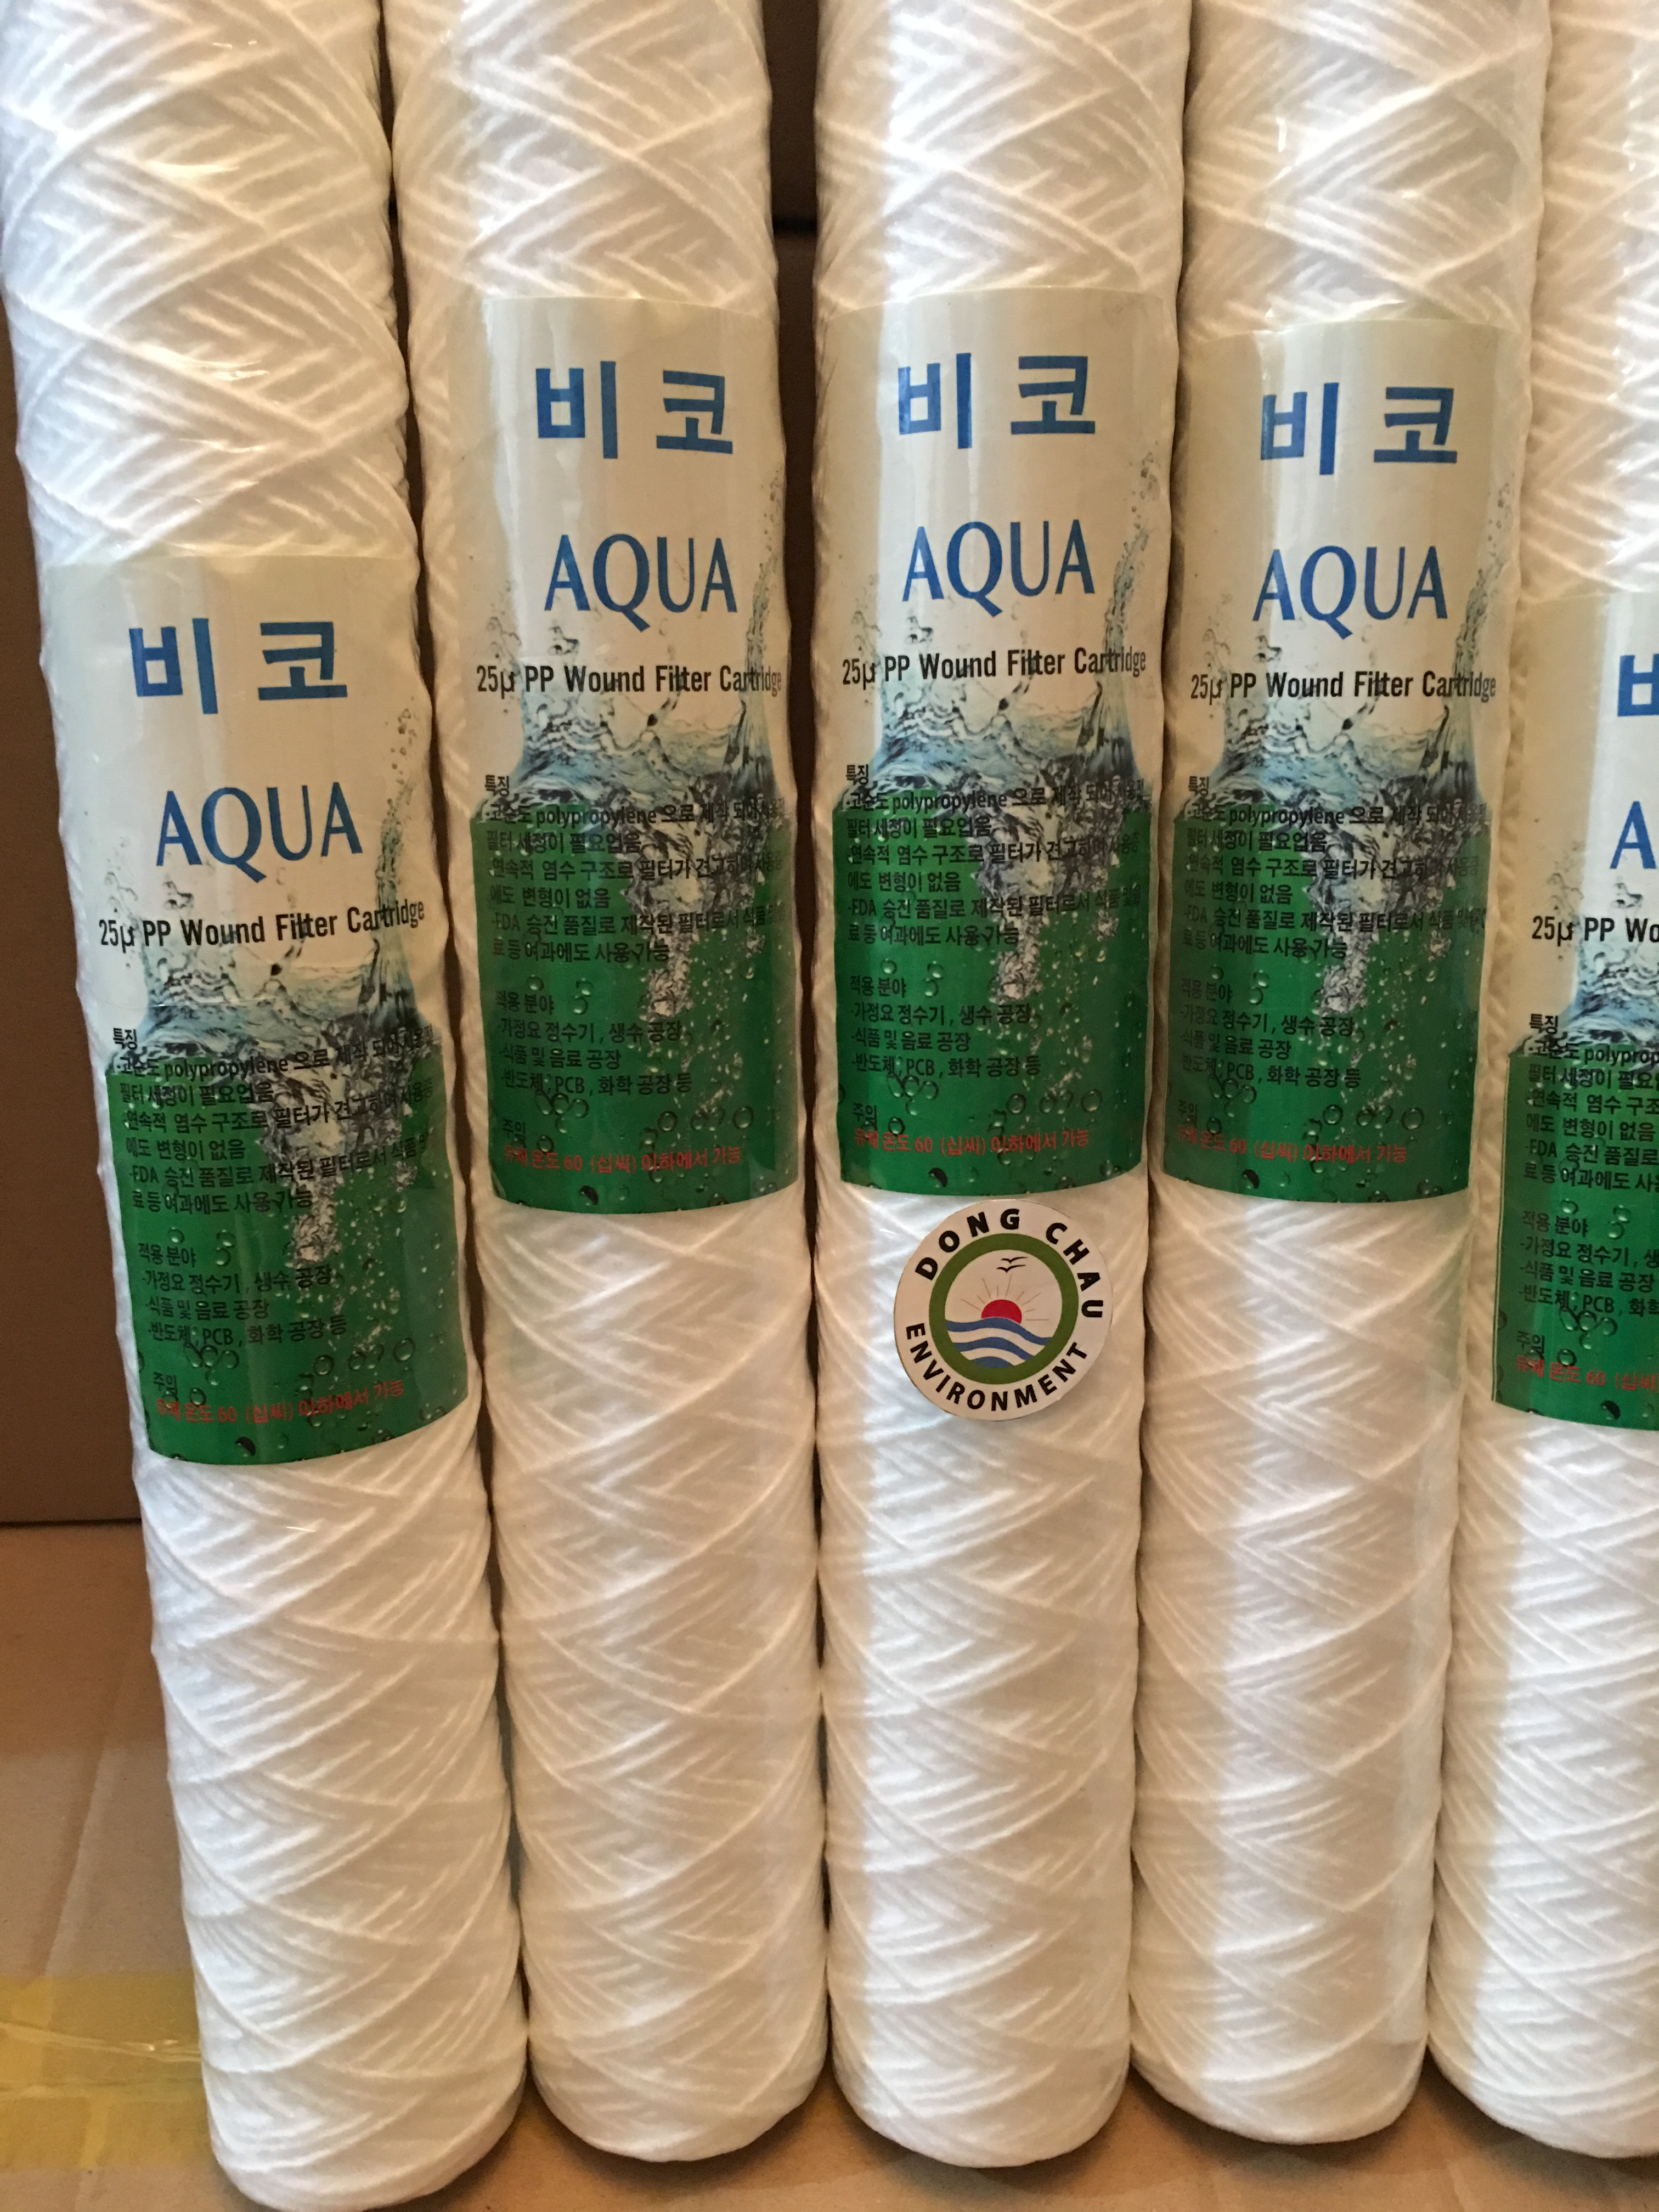 Lõi lọc sợi Aqua 25 micron 20 inch